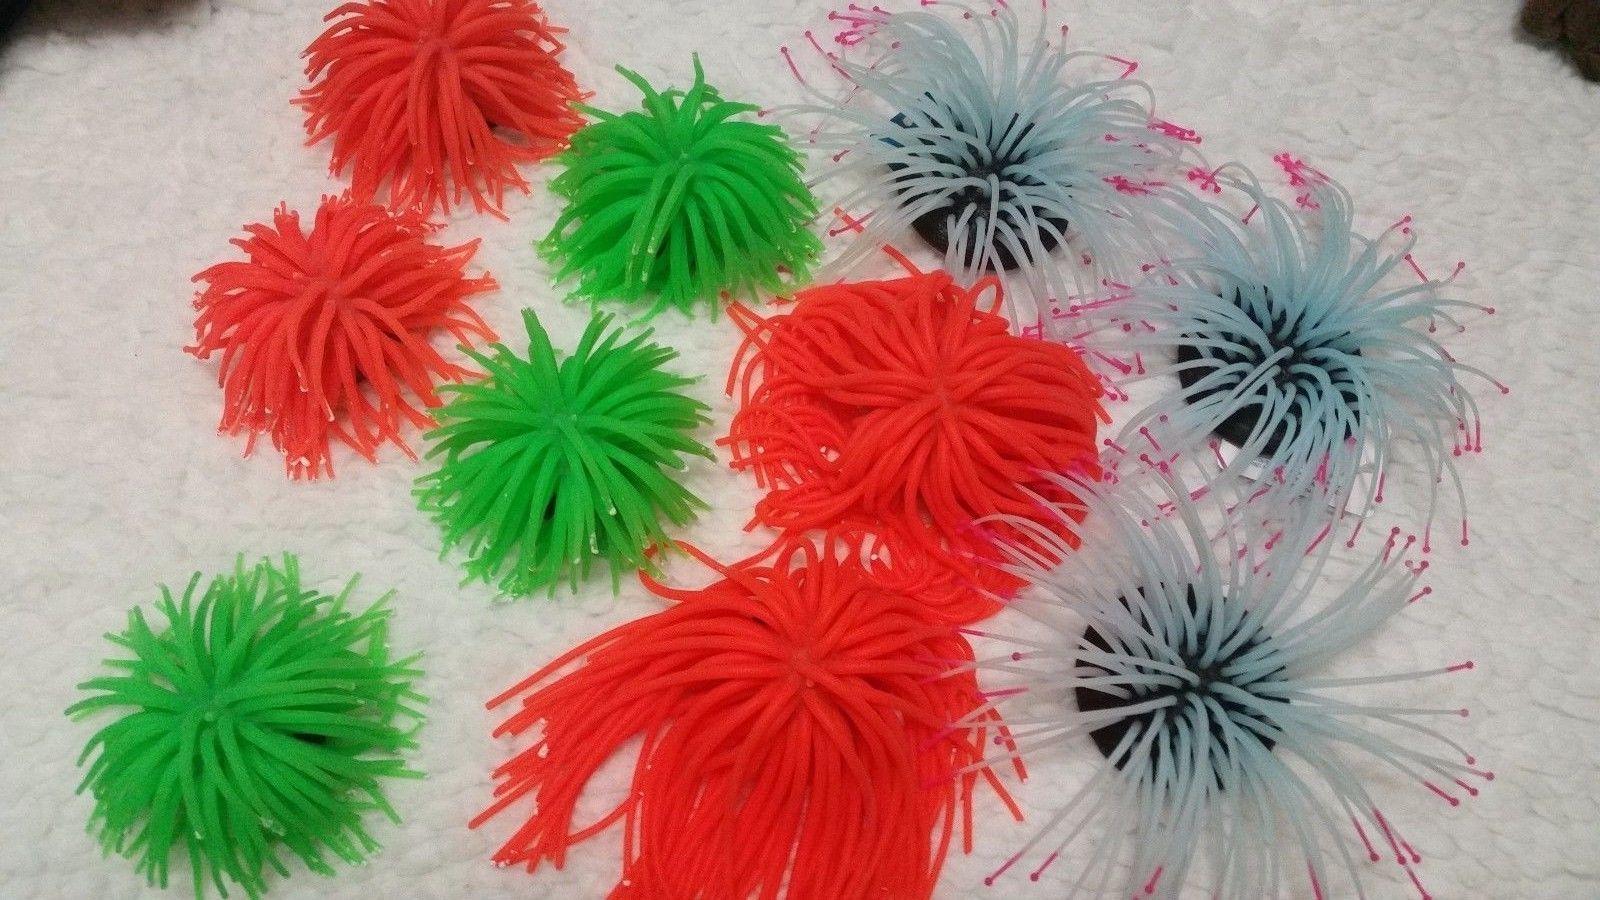 Top Fin GloFish Aquatic Décor Med Assorted Colors | Common Shopping ...